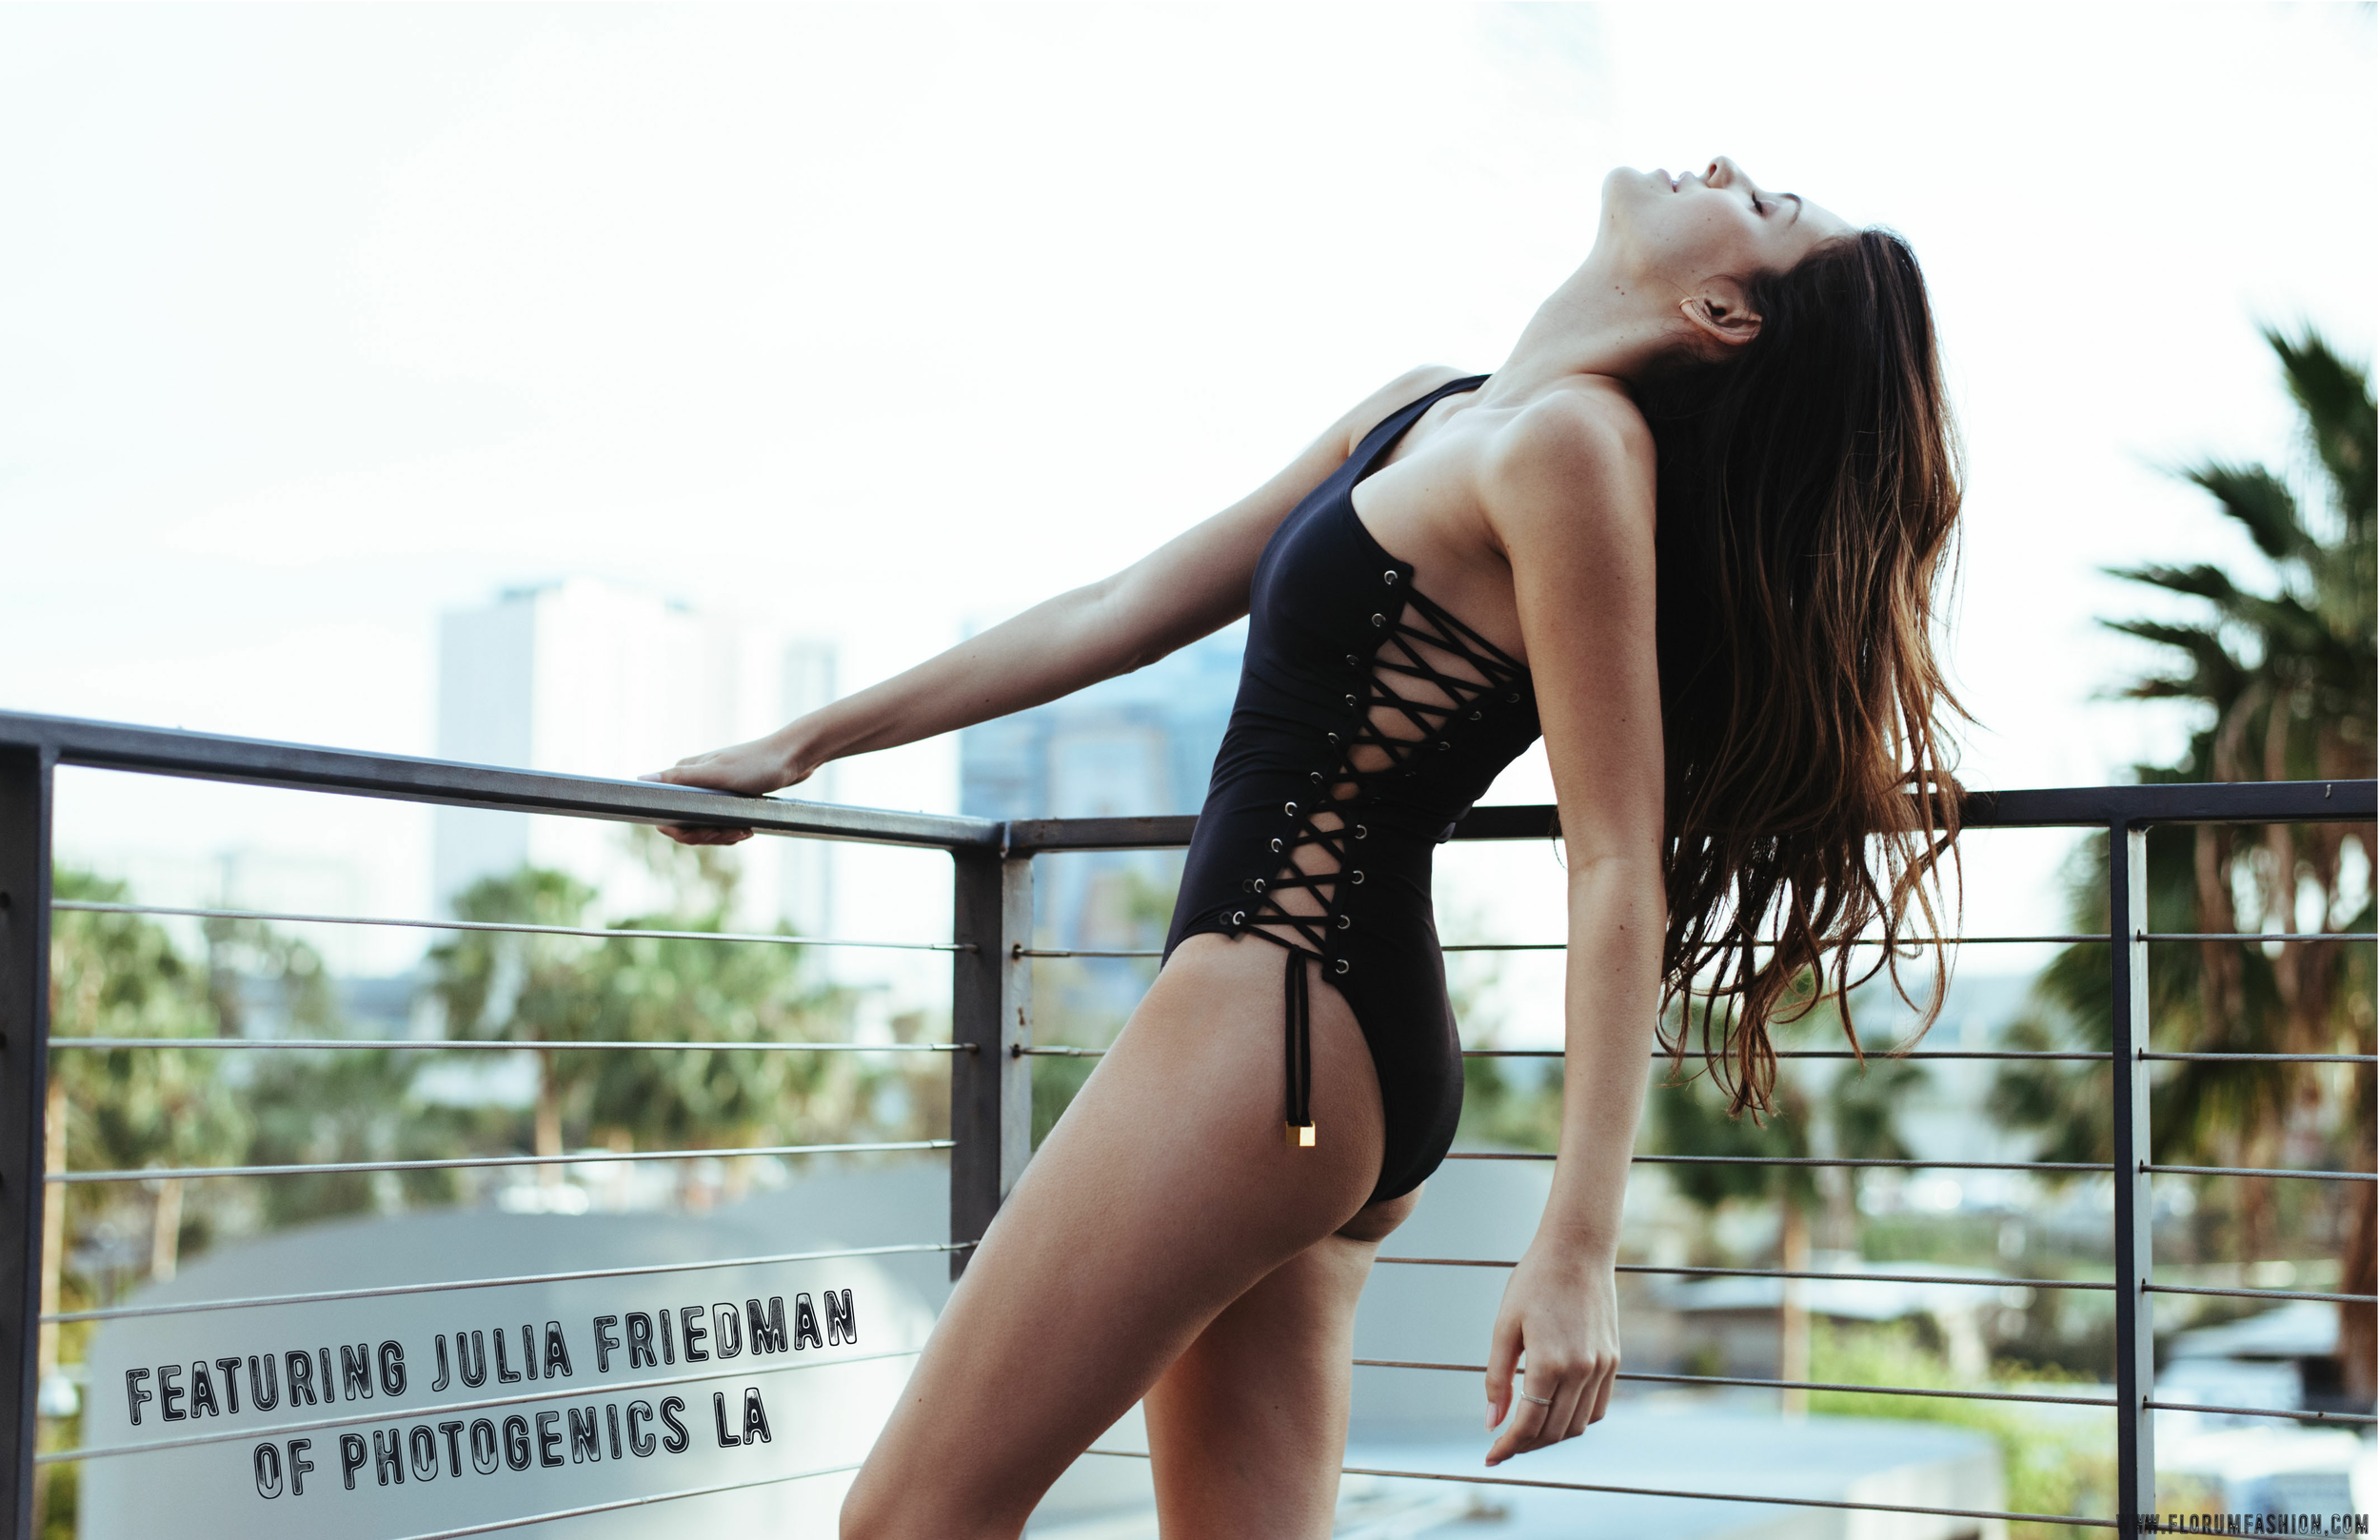 Charlotte Clough Luxury Swimwear - Florum Fashion Magazine - Stephen Sun - Julia Friedman - Photogenics LA - Slow Fashion - Ethical Fashion - Green Swimsuits